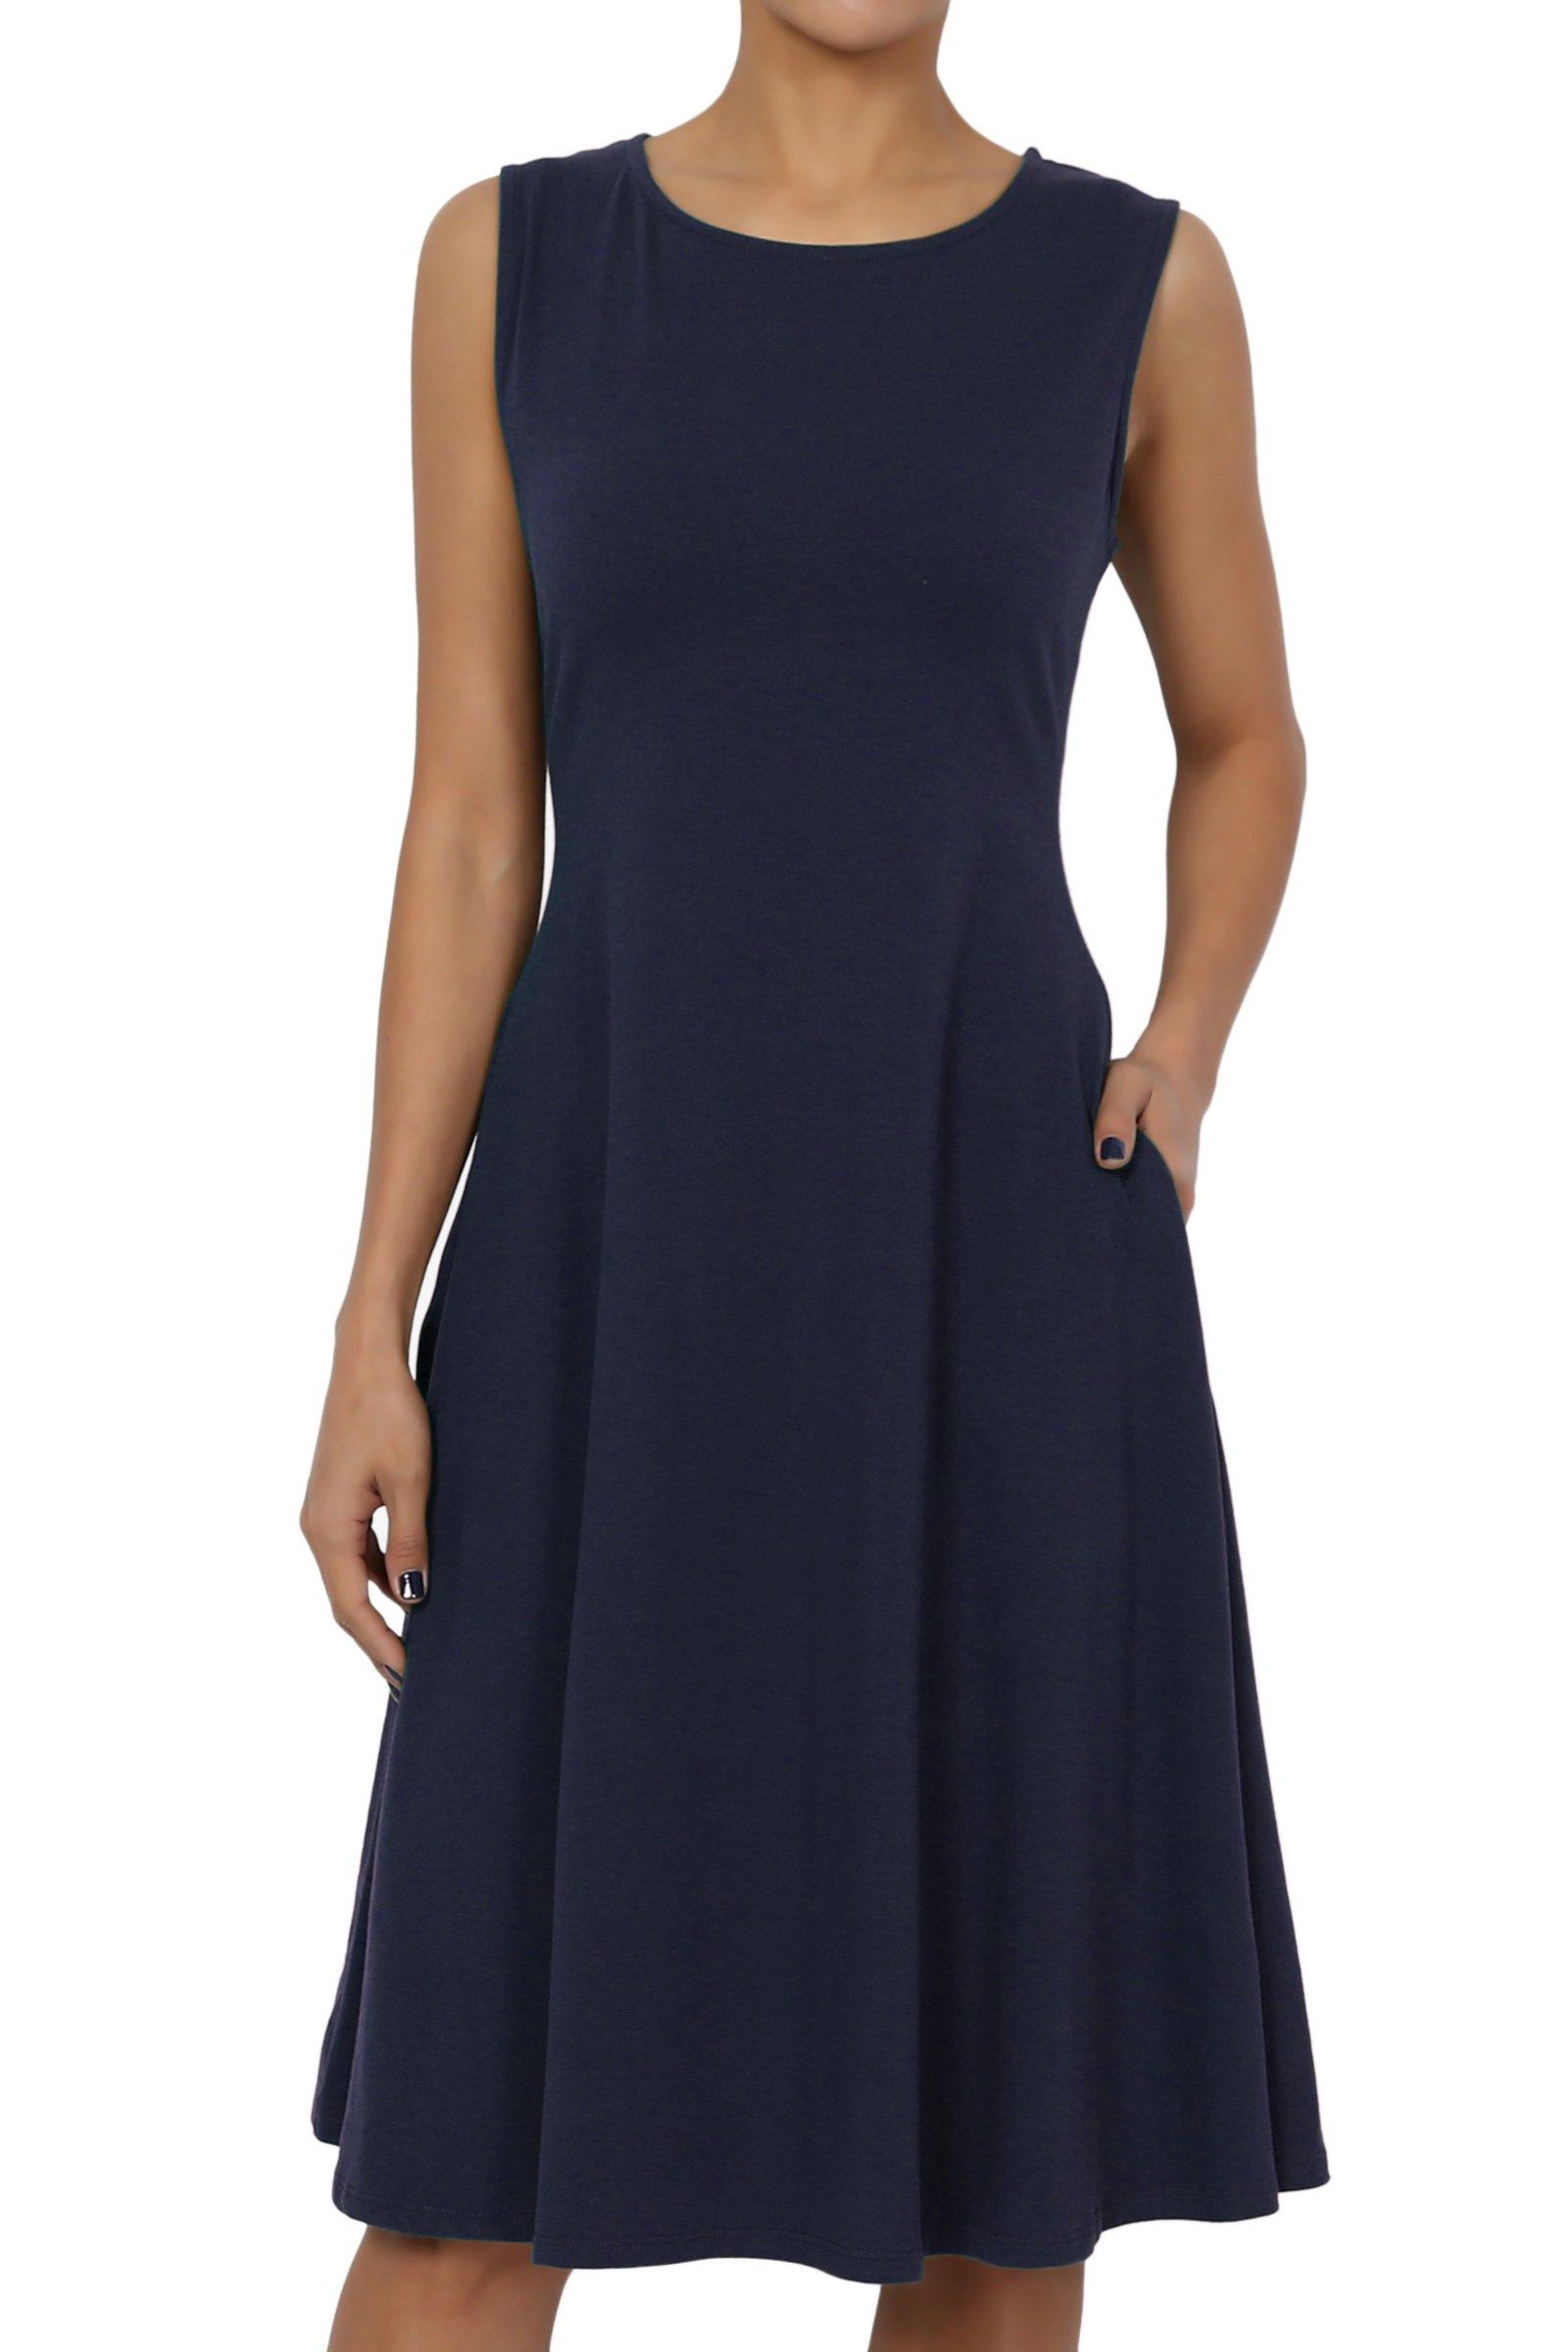 TheMogan Women's Sleeveless Pocket Stretch Cotton Fit & Flare Dress Navy XL